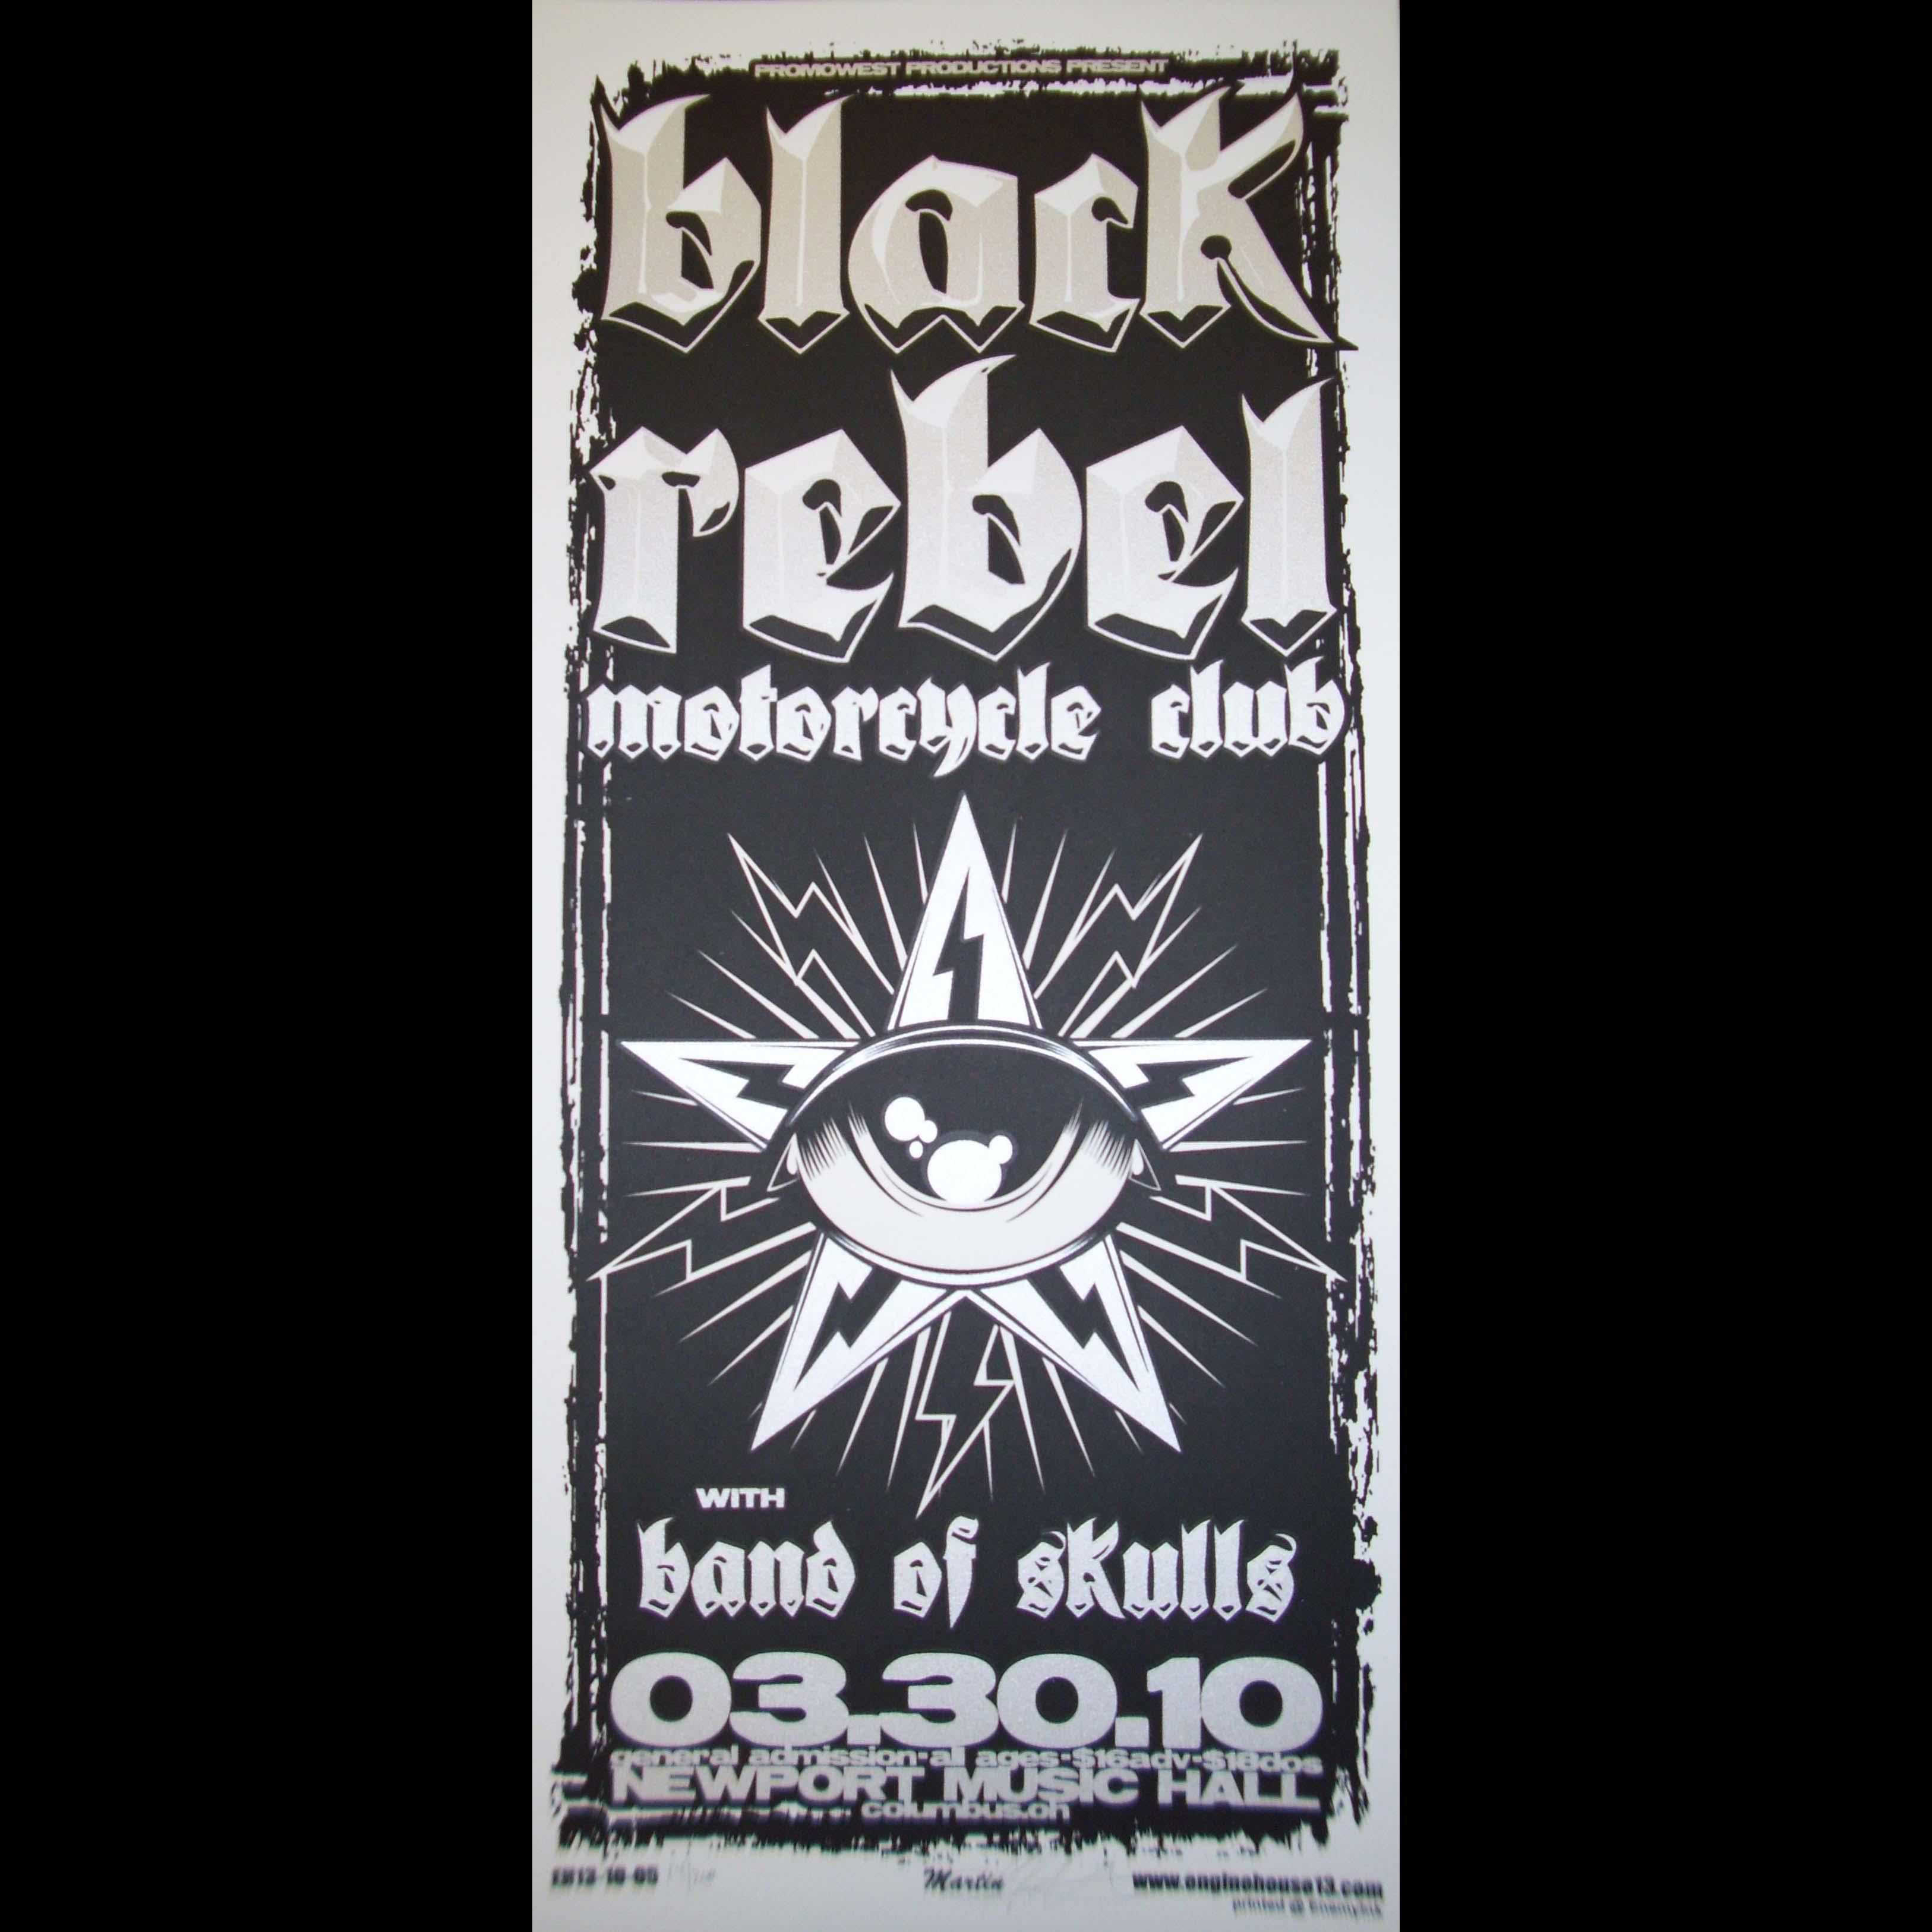 T shirt black rebel motorcycle club - Black Rebel Motorcycle Club Poster 0